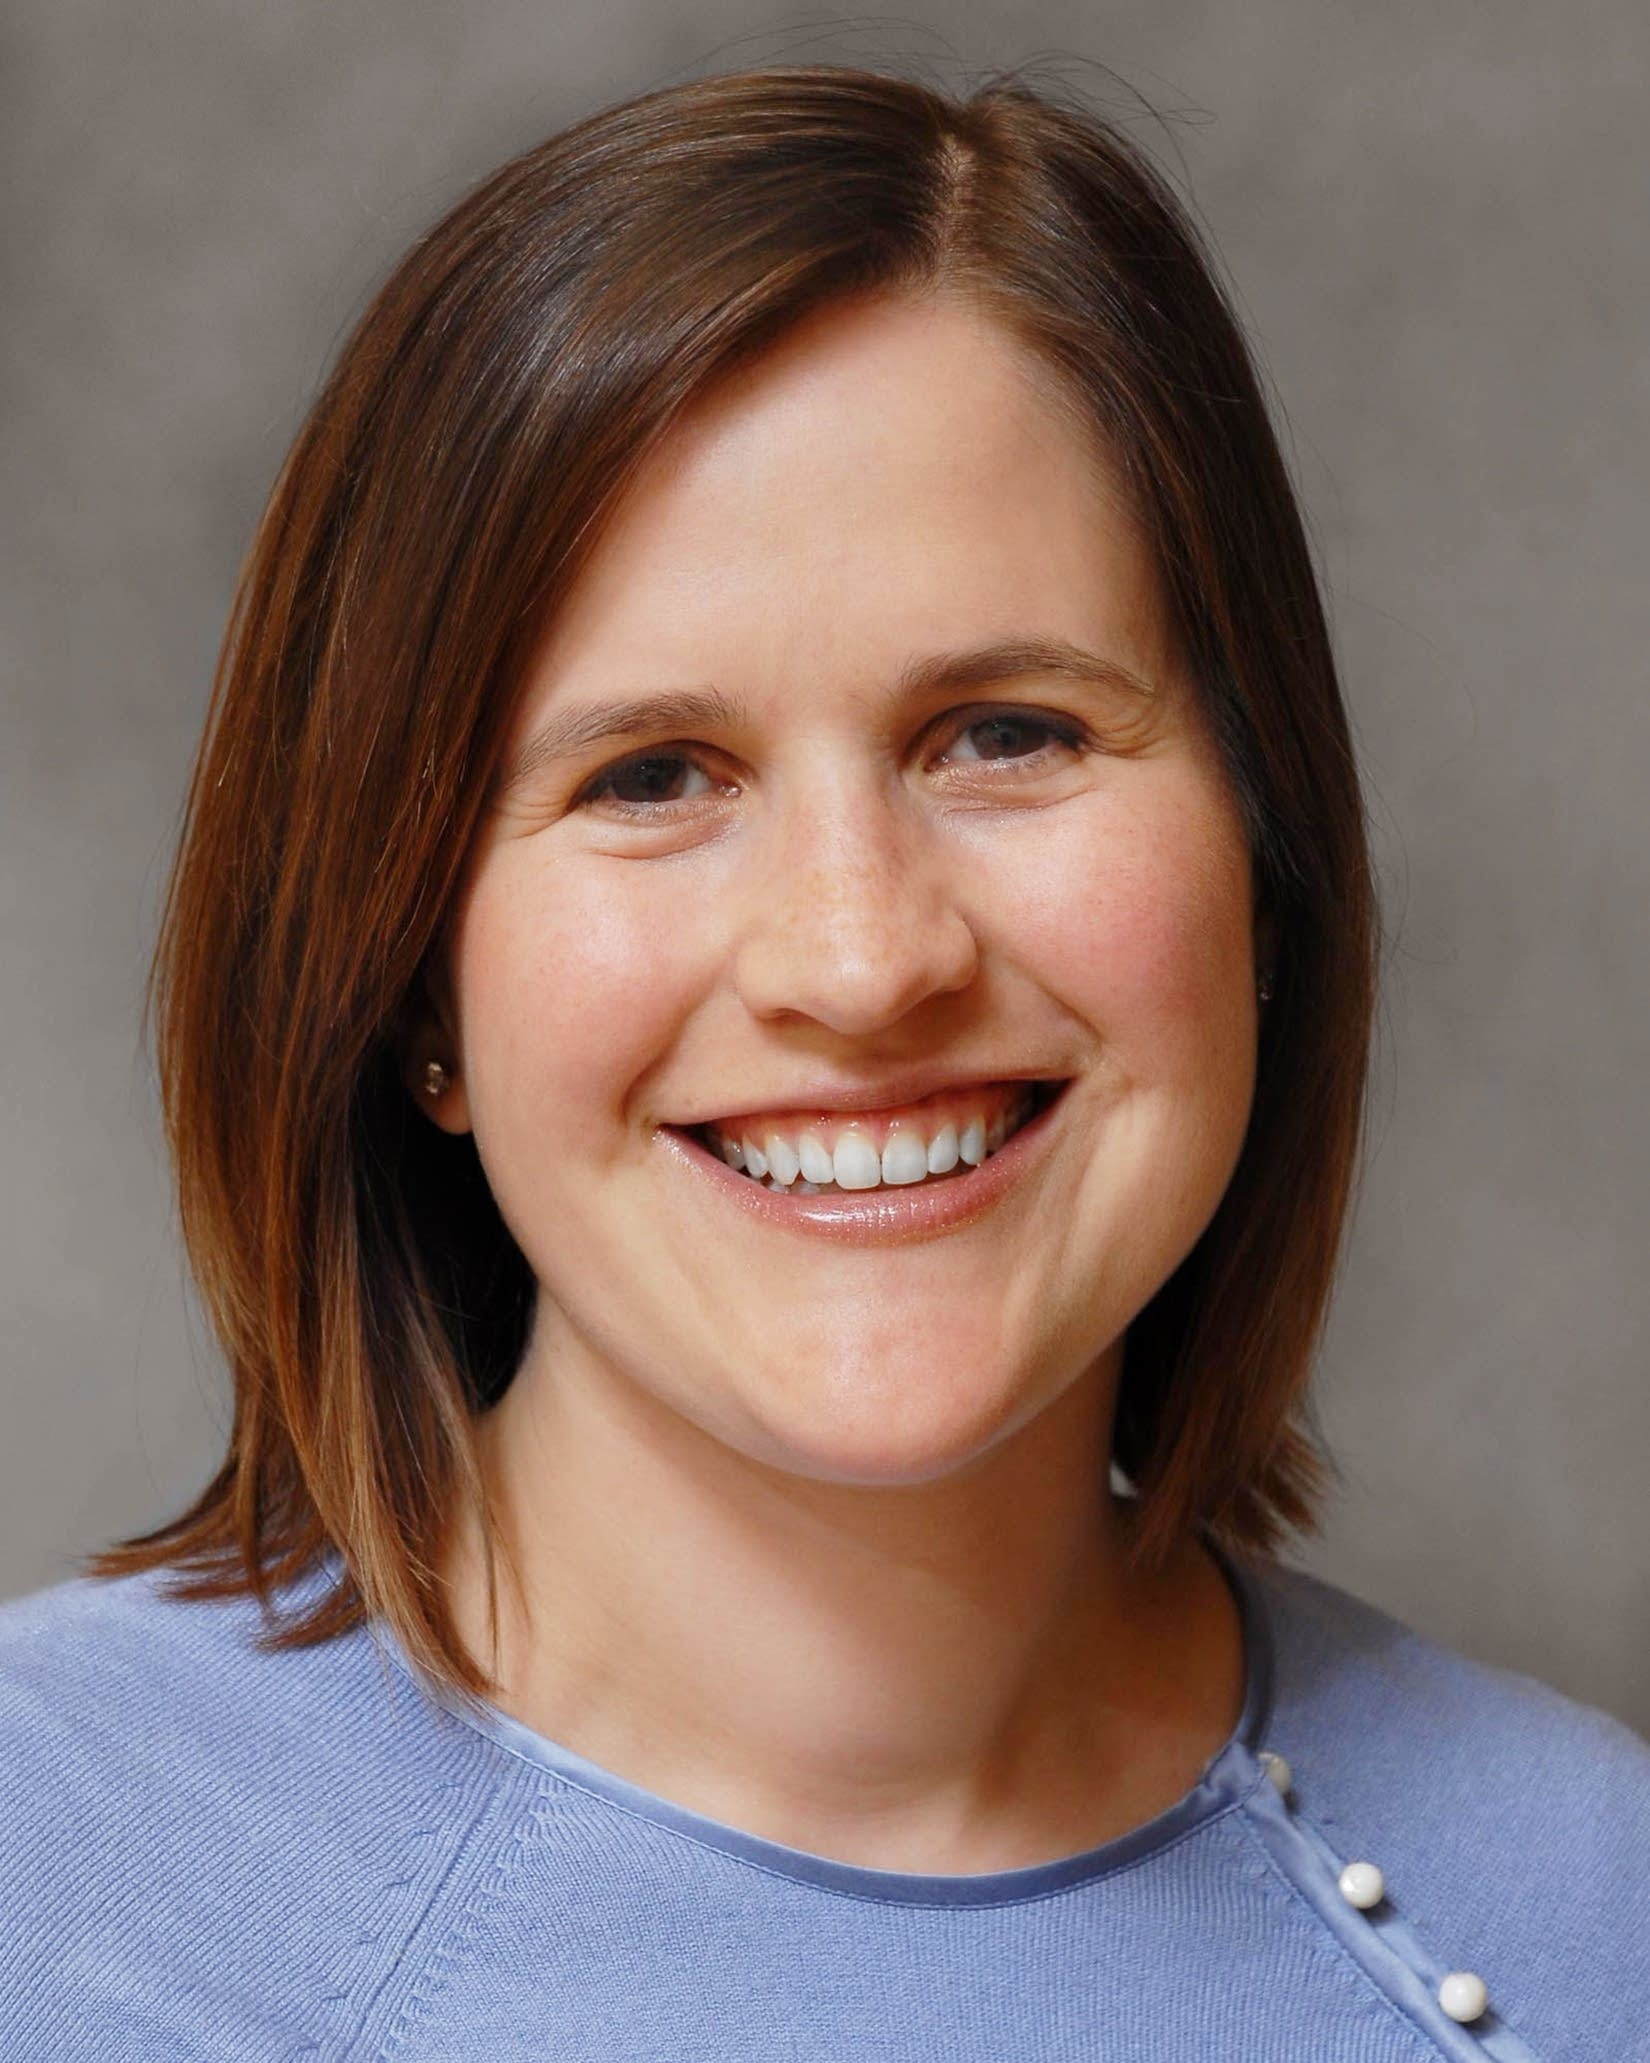 Emily Borman-Shoap runs the pediatric residency program at the U.